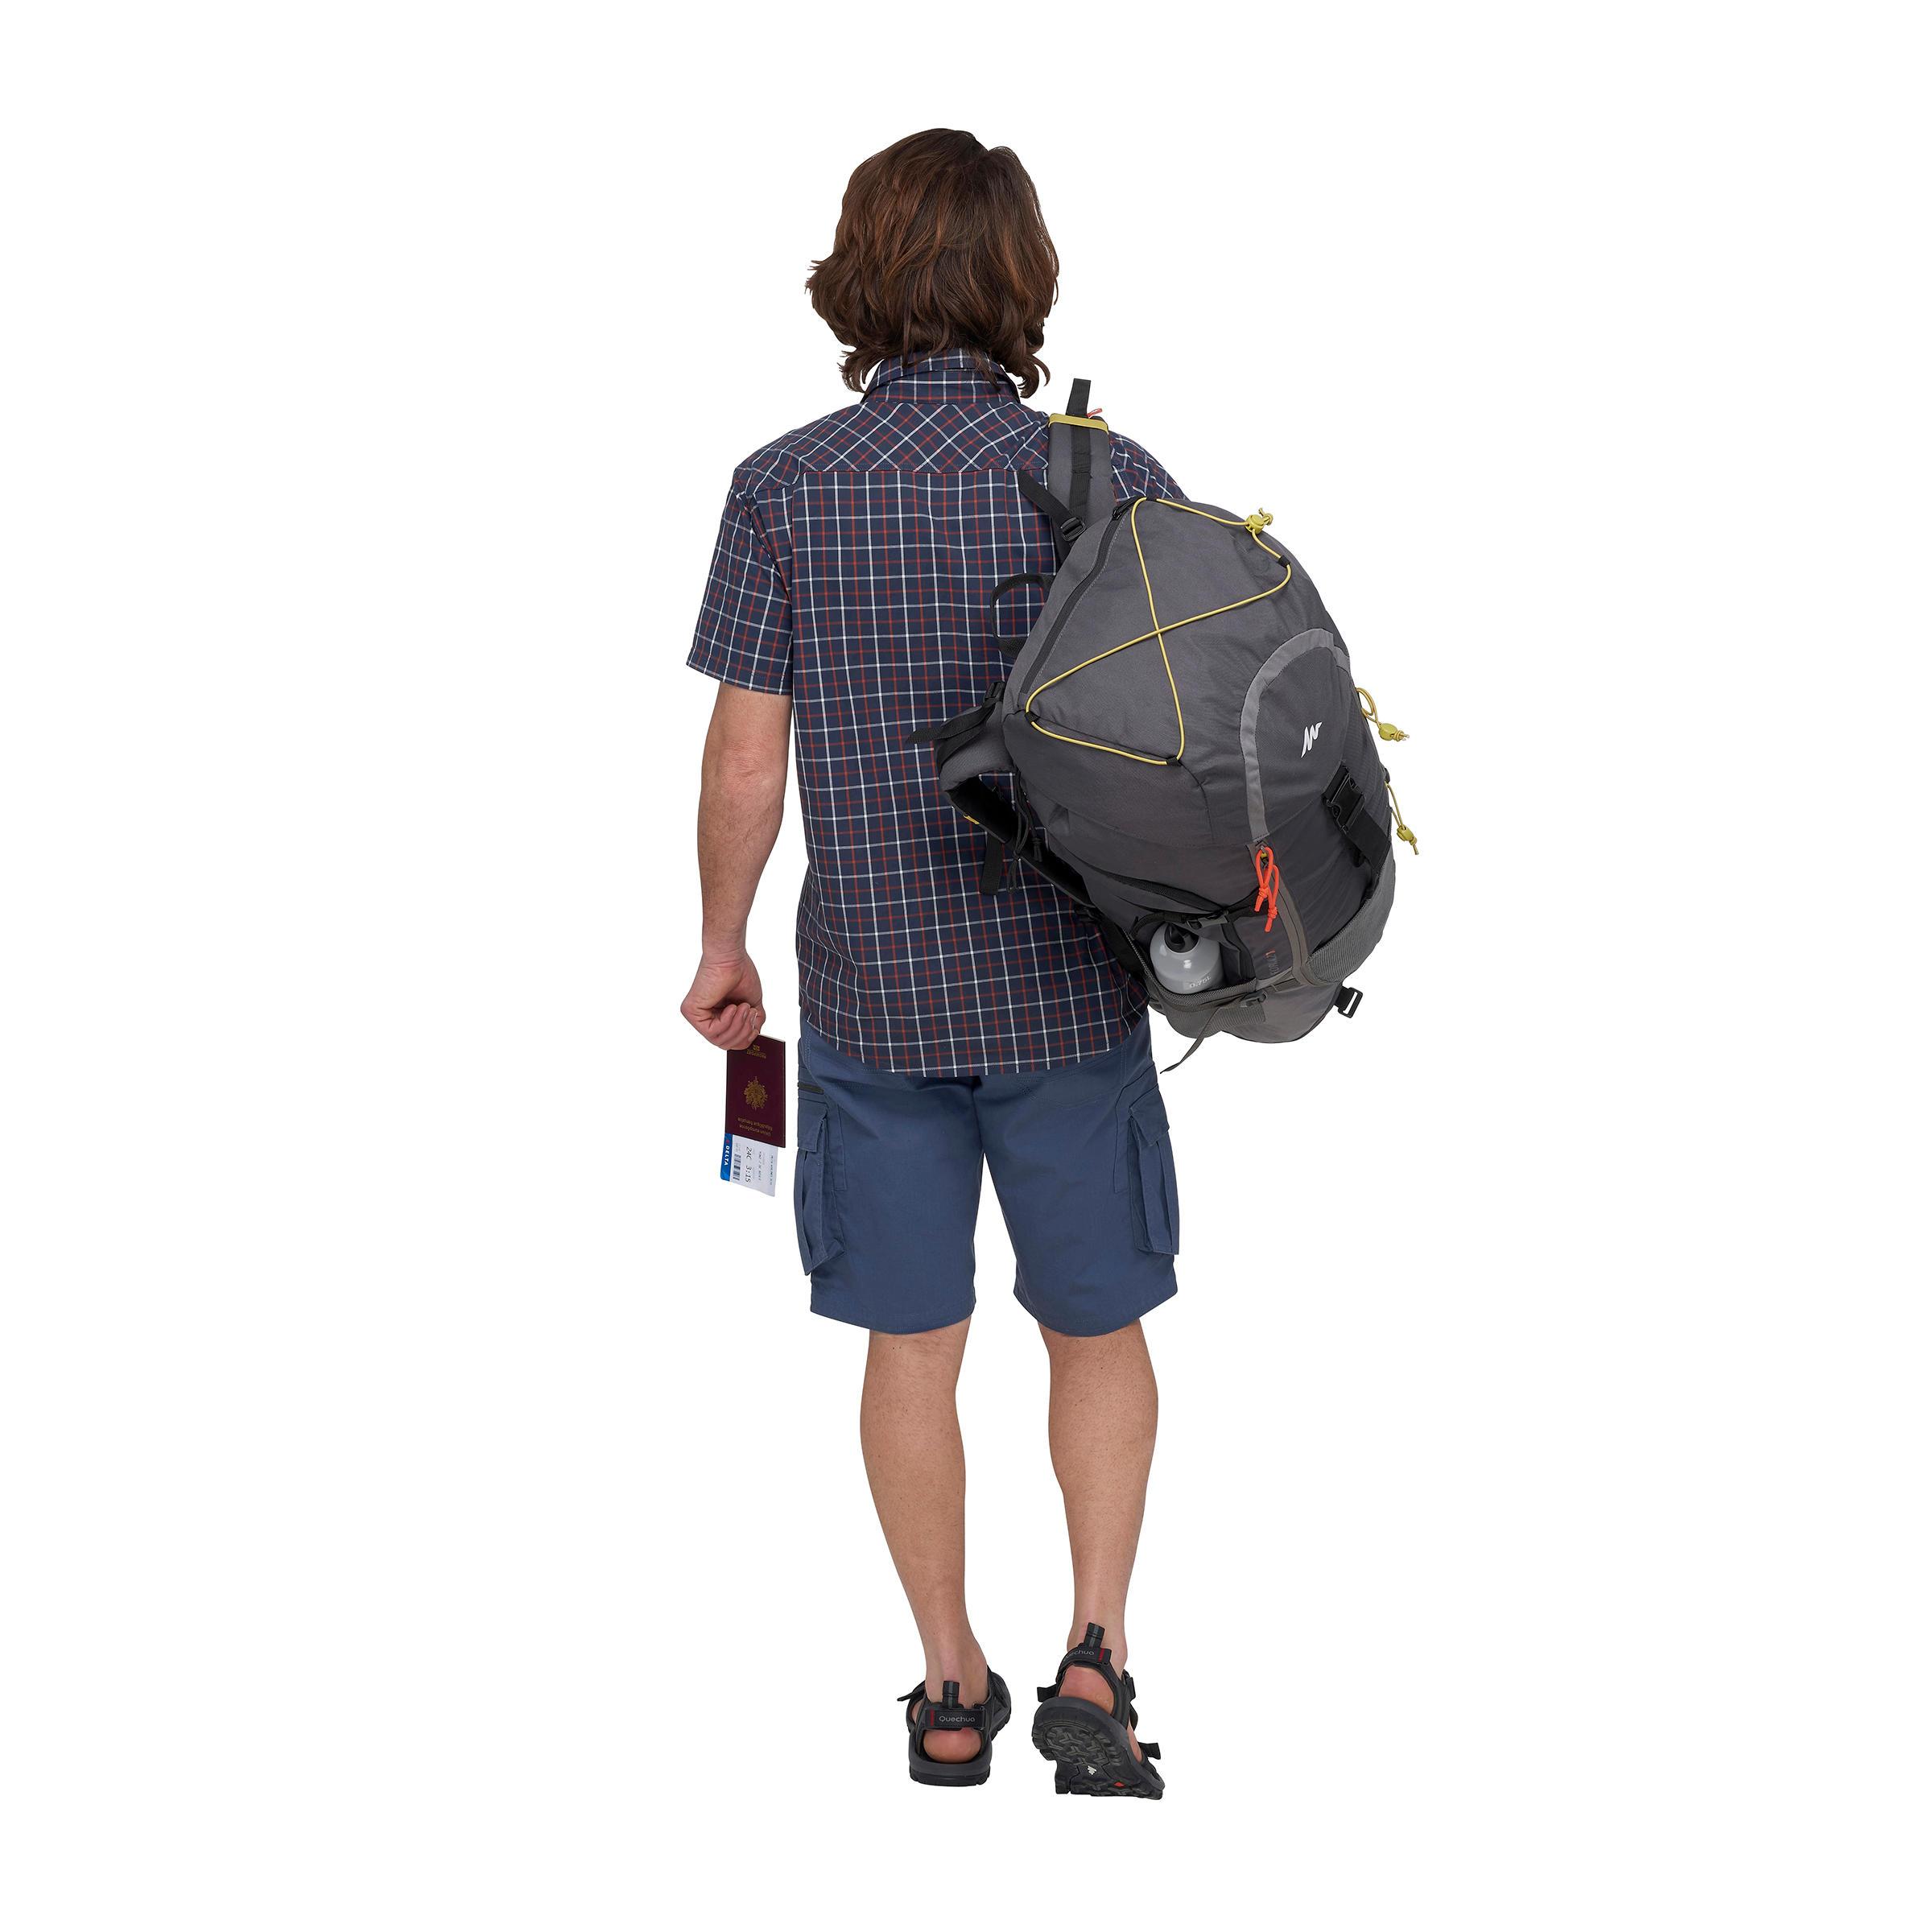 Arpenaz 100 Men's Backpacking Sandal Black